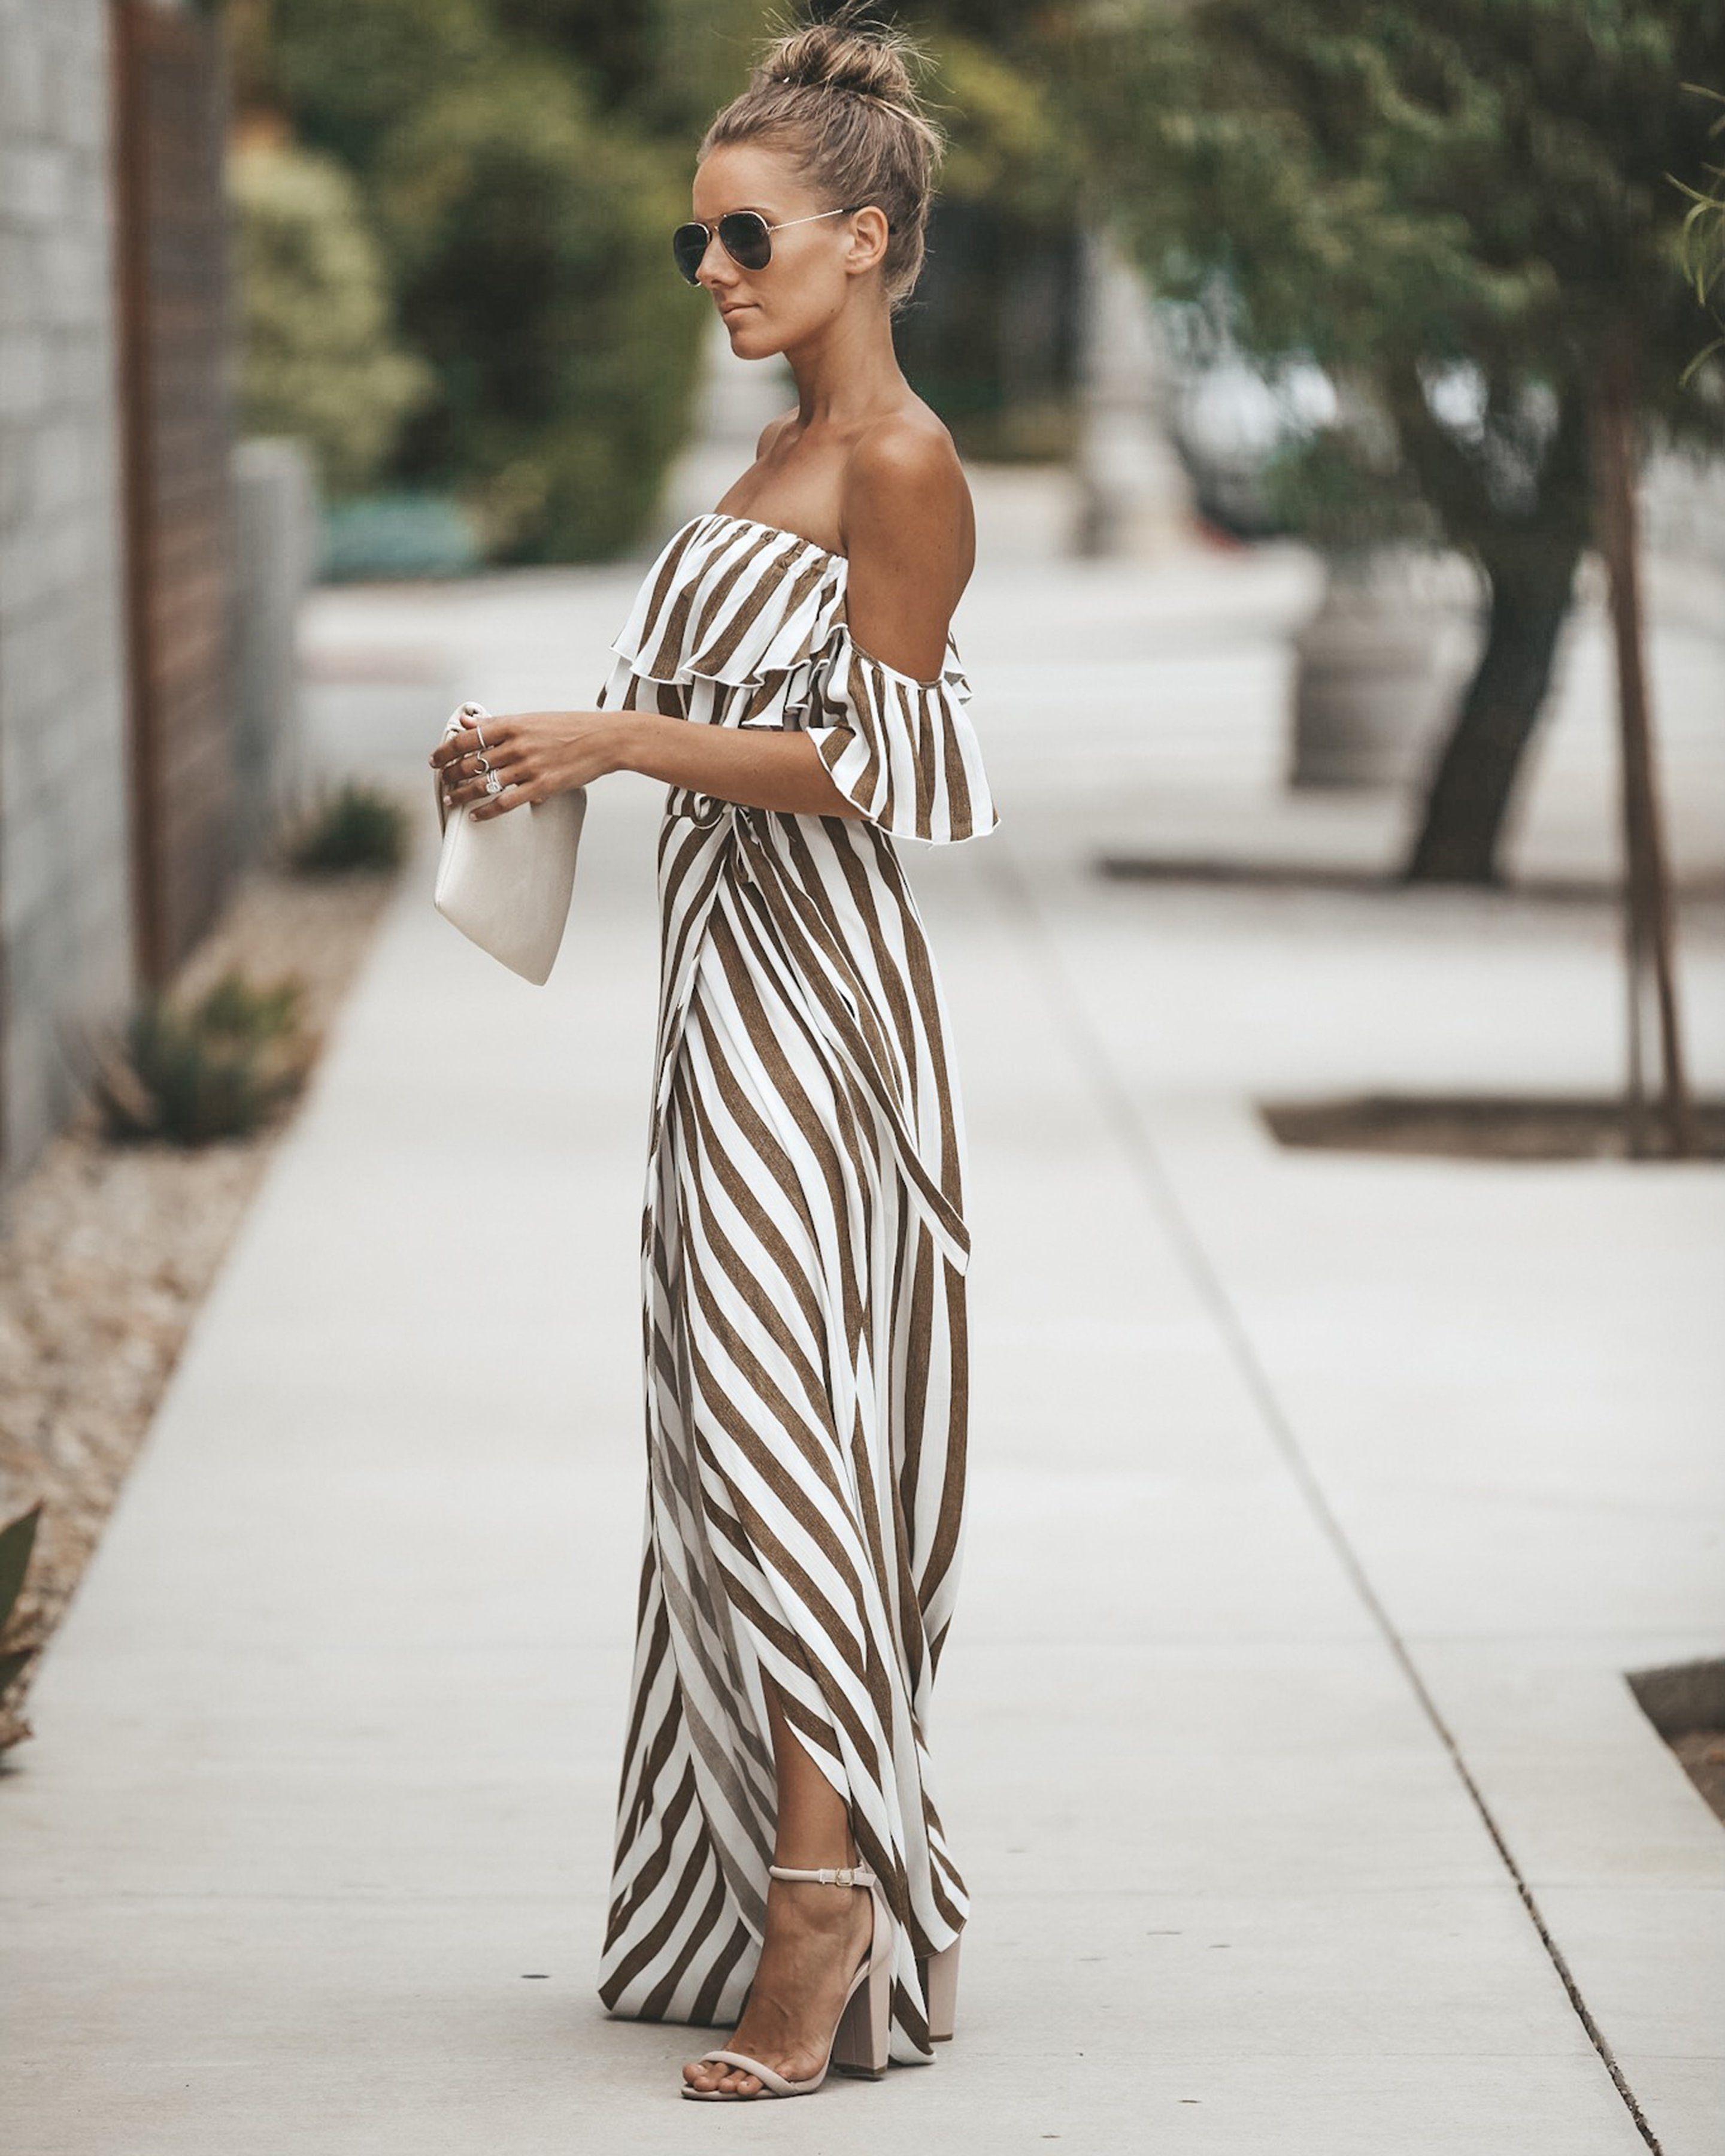 Eclipse Striped Wrap Maxi Dress Dark Taupe Maxi Dress Womens Summer Fashion Outfits Fashion [ 3600 x 2881 Pixel ]